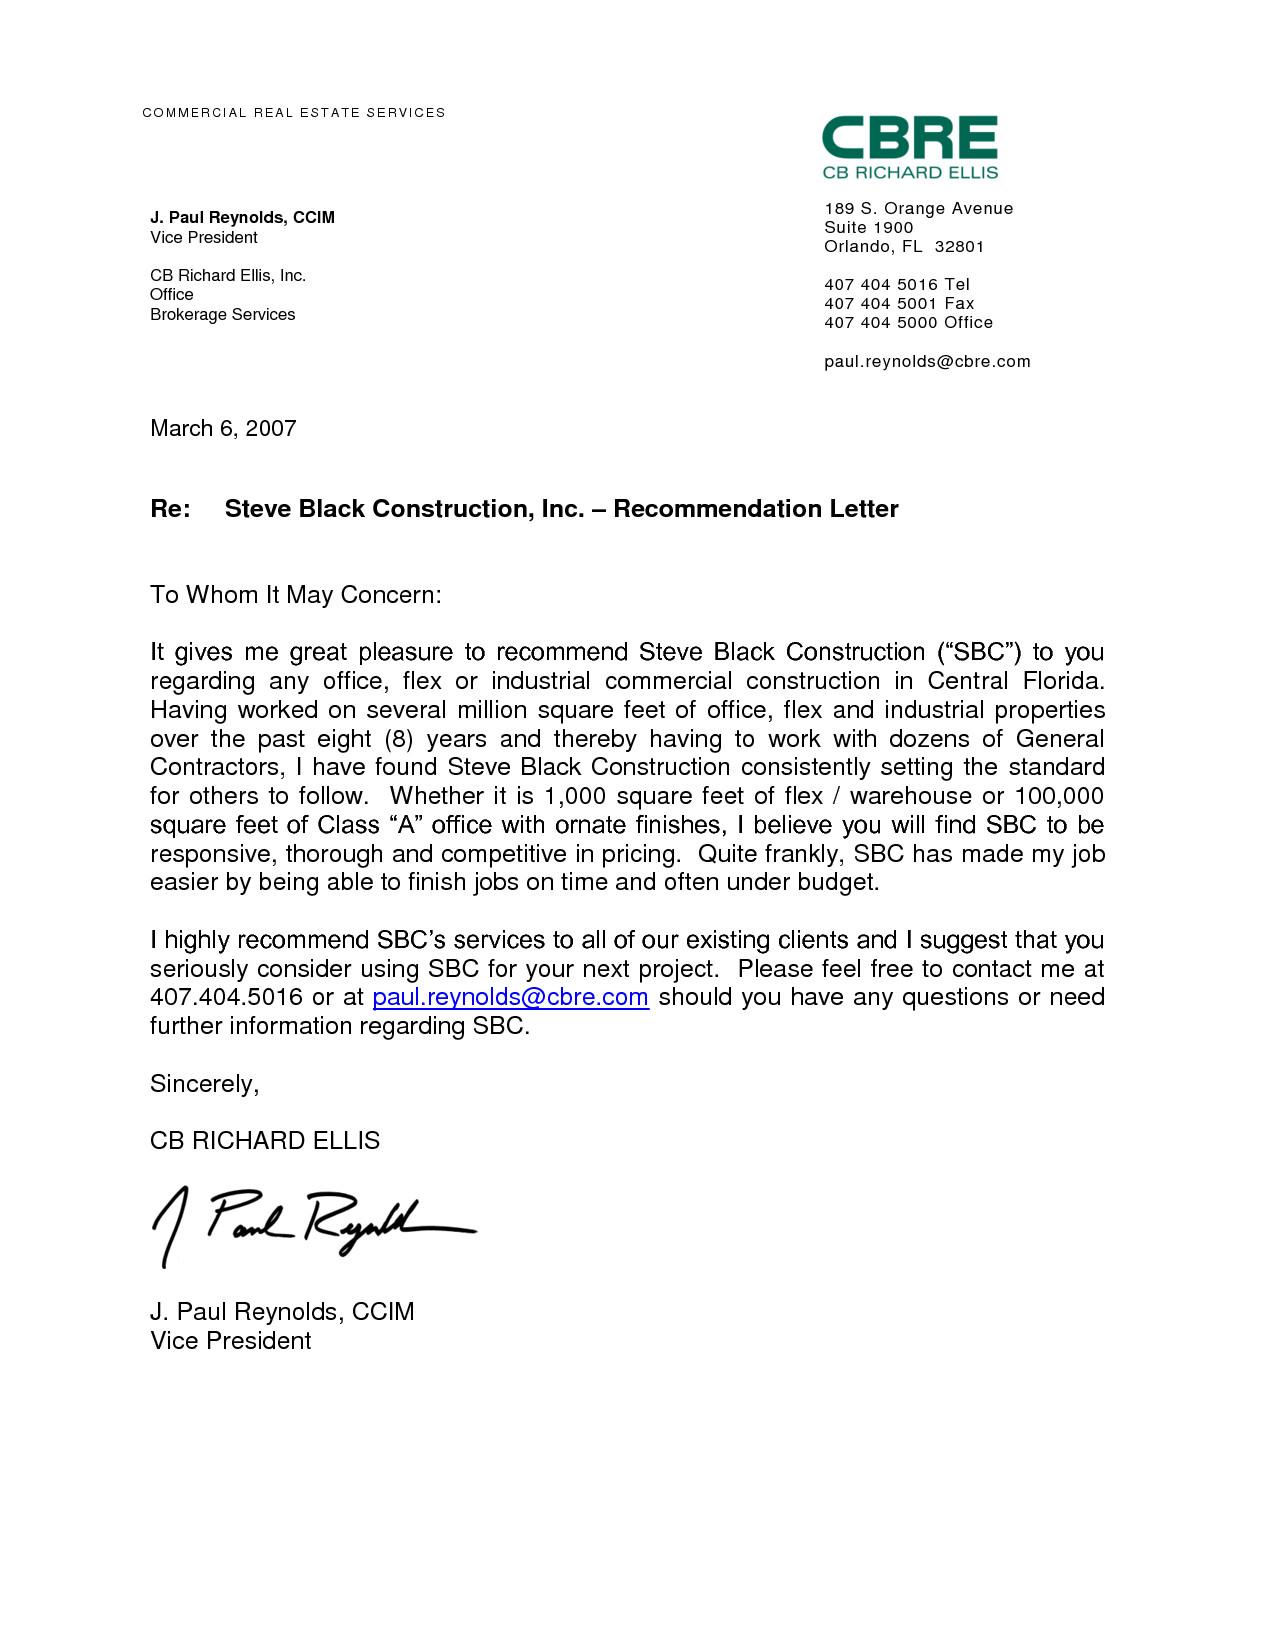 Recommendation Letter Template for Job Reference Letter for A Job Best Letter